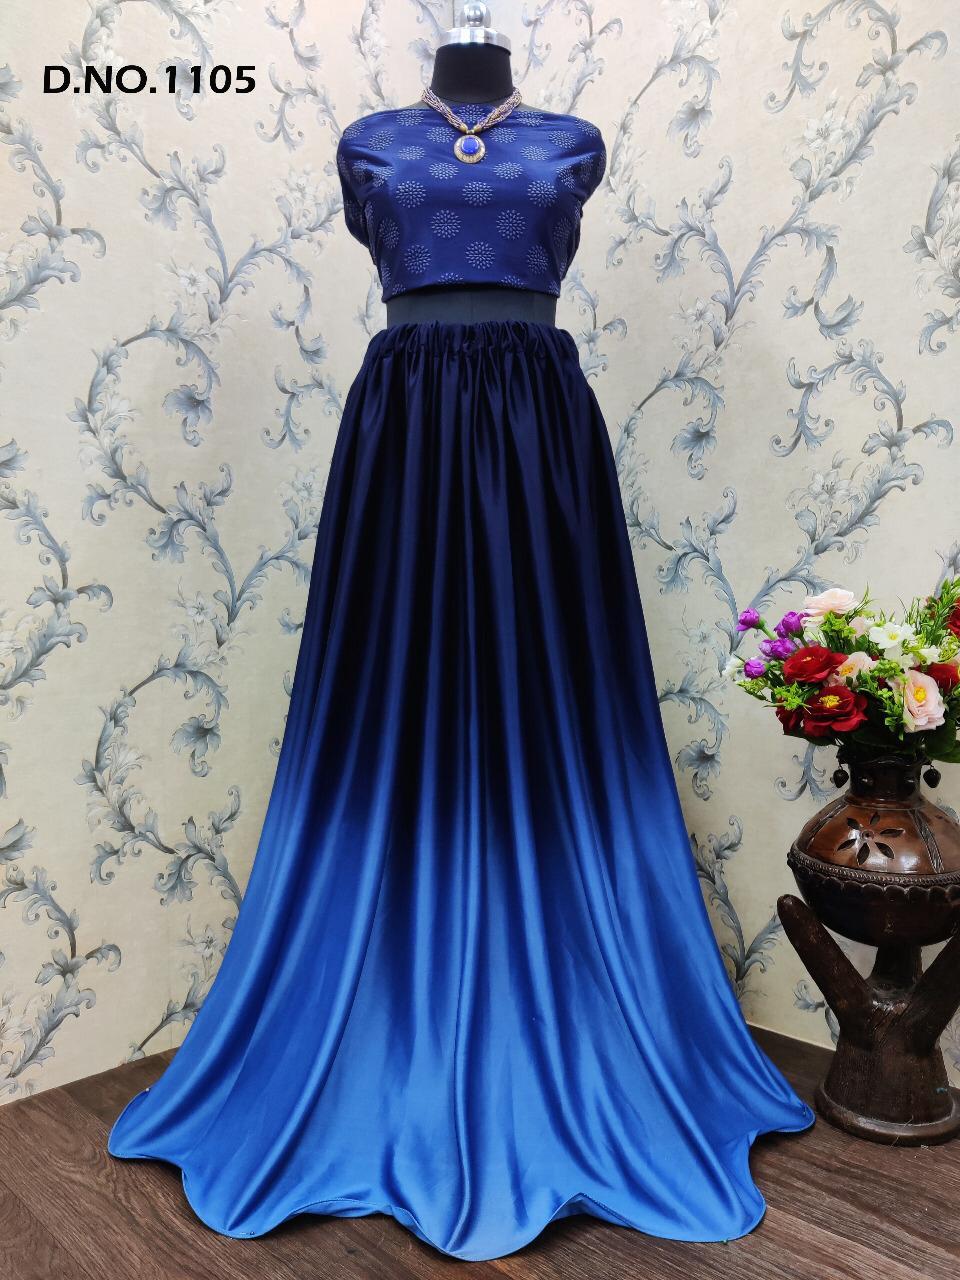 Varni Fashion Zaira Choli Skirts Vol-2 Designer Lycra Shaded Lehenga